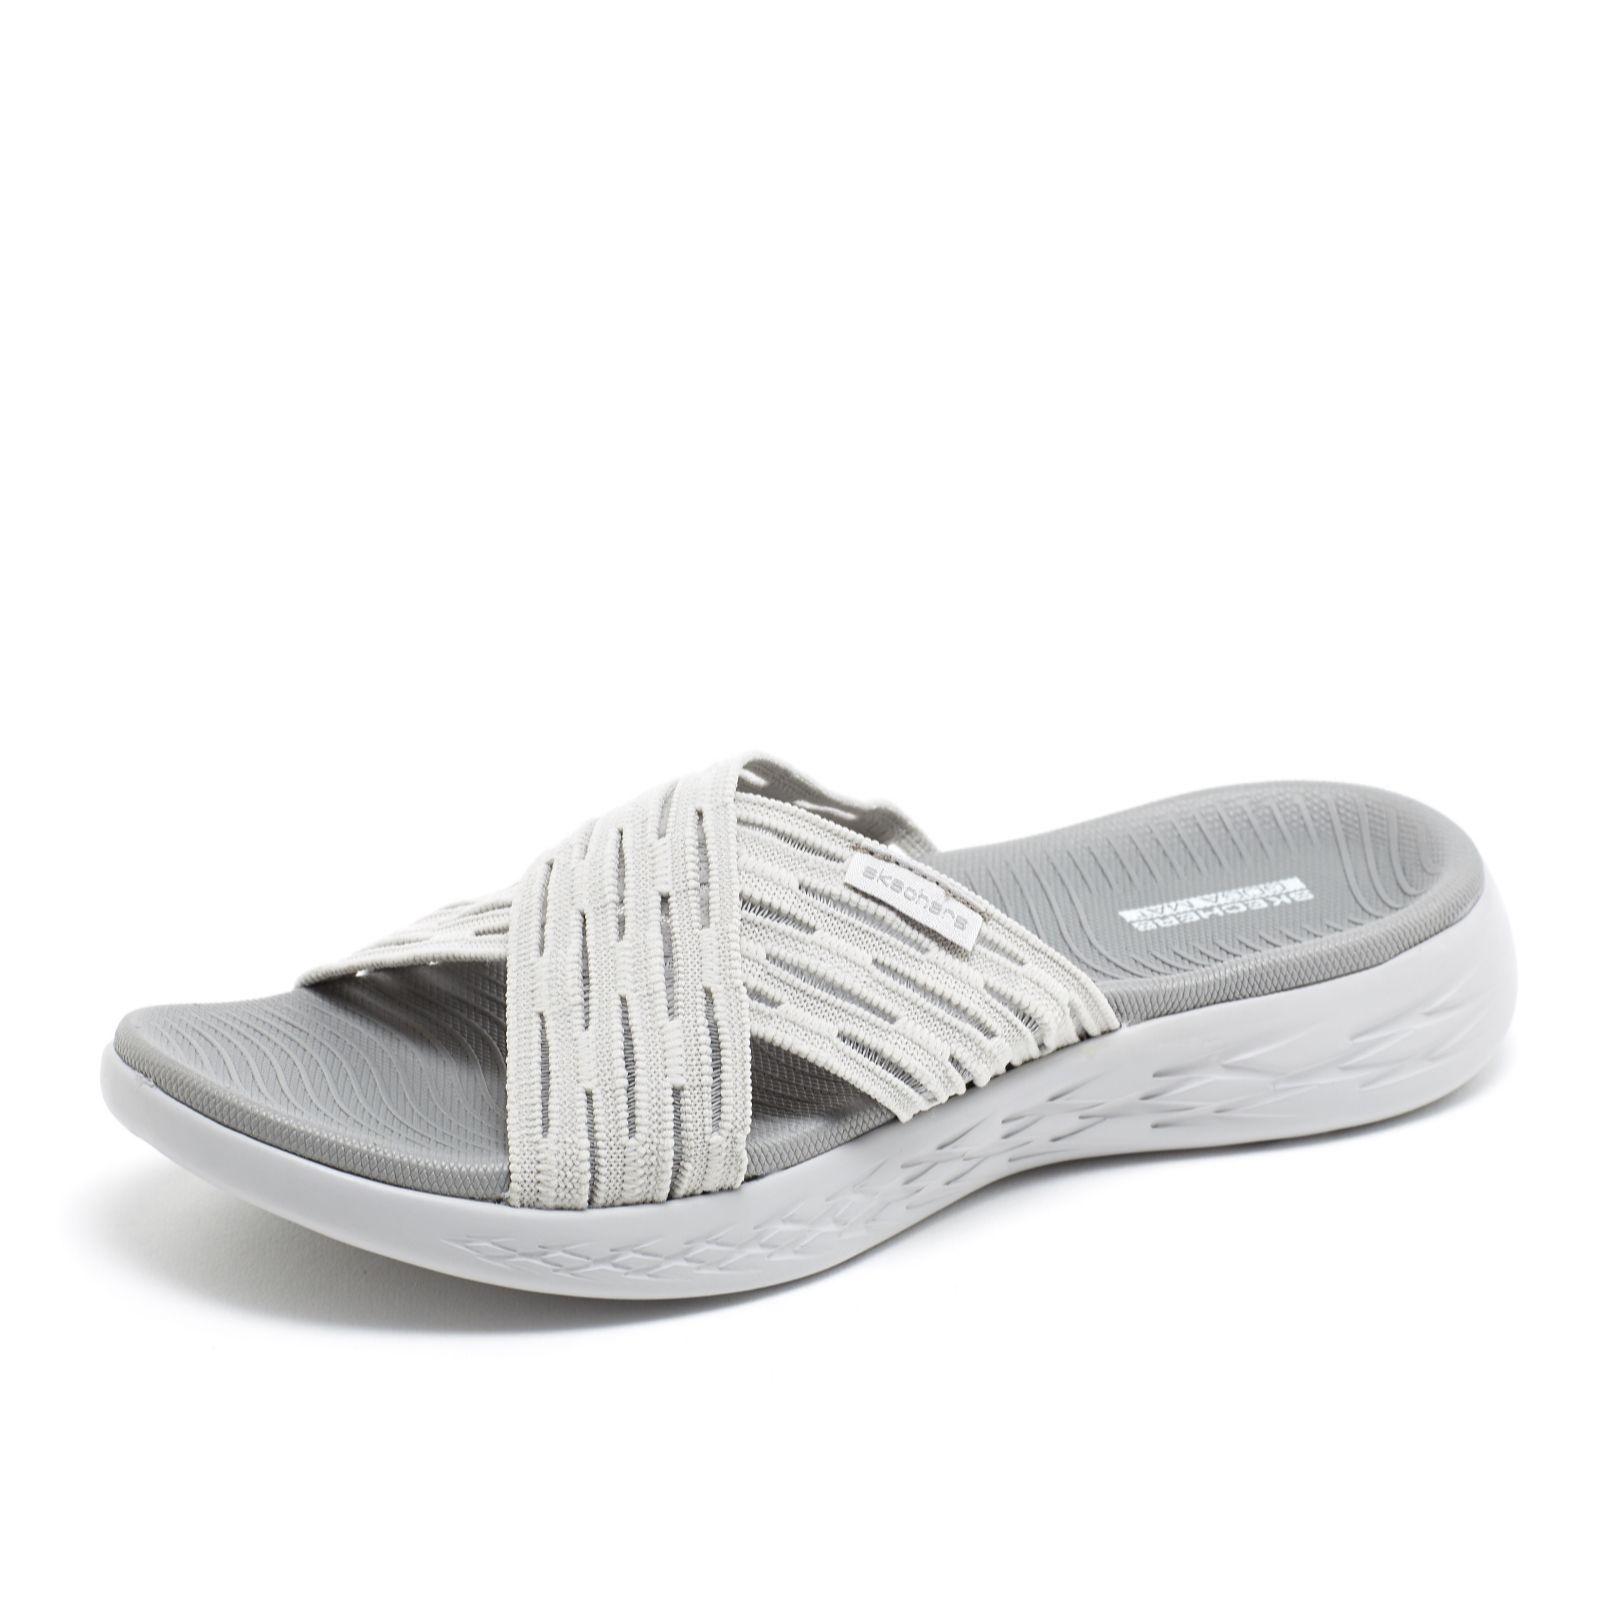 skechers on the go sandals uk